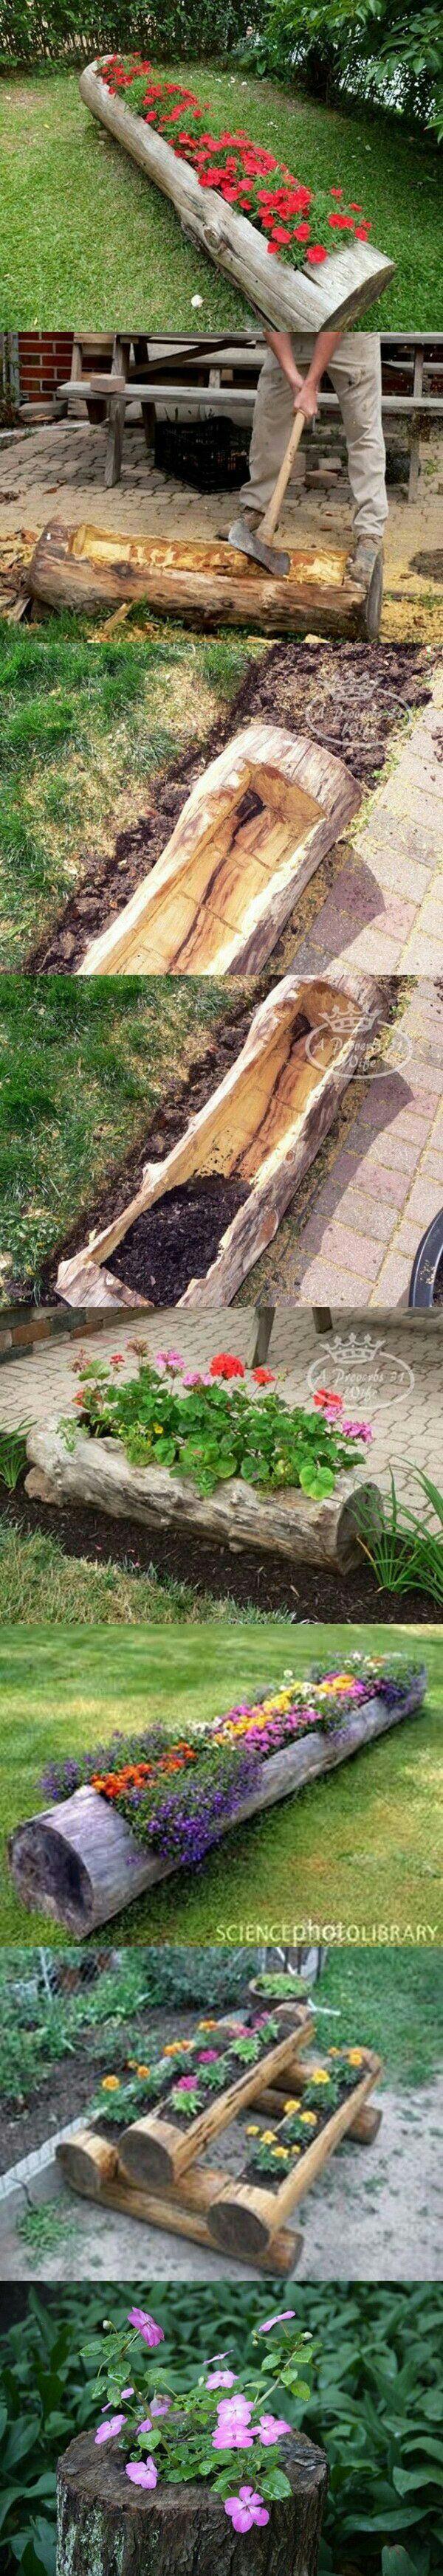 Pin by kosta badger on garden pinterest firs gardens and garden